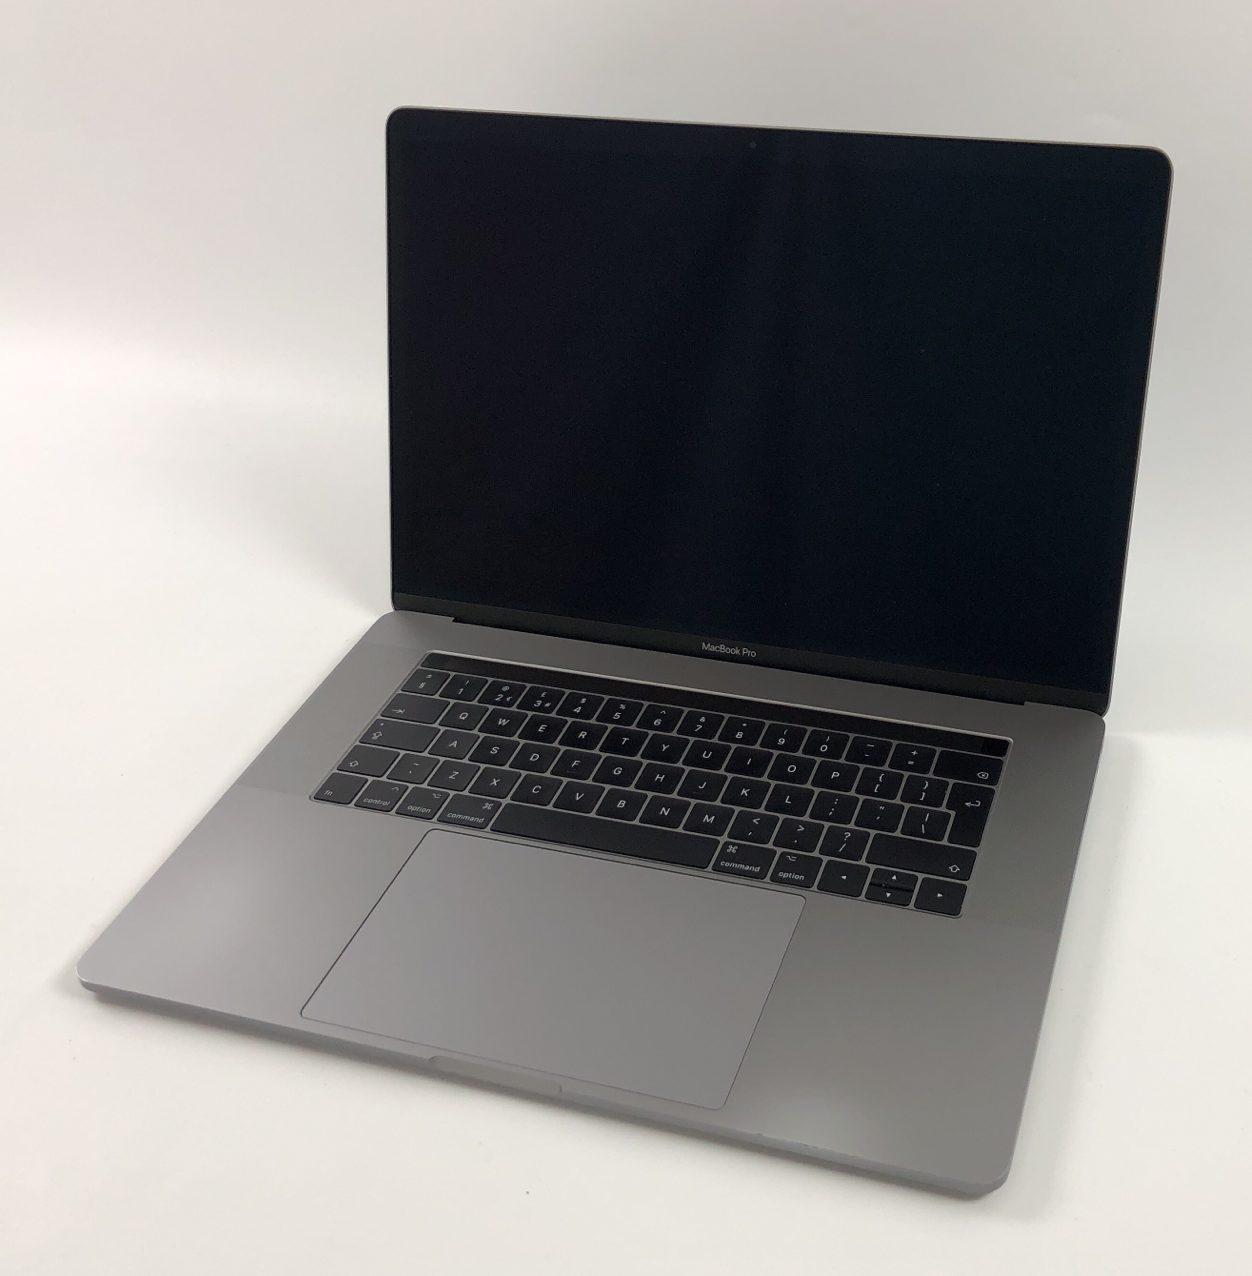 "MacBook Pro 15"" Touch Bar Mid 2017 (Intel Quad-Core i7 2.8 GHz 16 GB RAM 256 GB SSD), Space Gray, Intel Quad-Core i7 2.8 GHz, 16 GB RAM, 256 GB SSD, image 1"